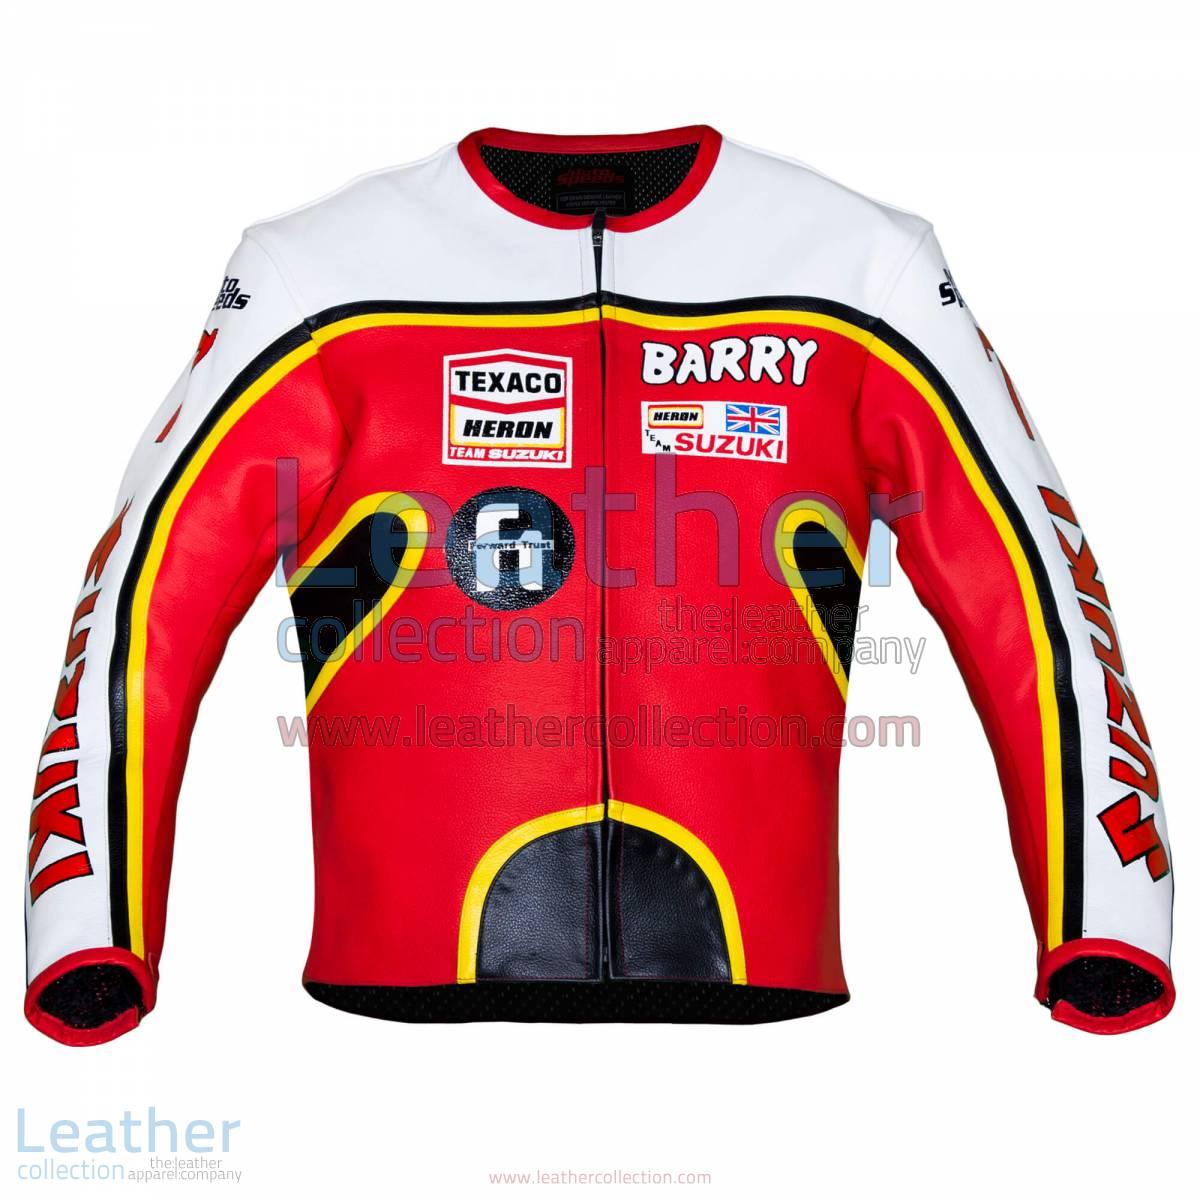 Barry Sheene Suzuki GP 1976 Leather Jacket | Barry Sheene,Barry Sheene Suzuki GP 1976 Leather Jacket